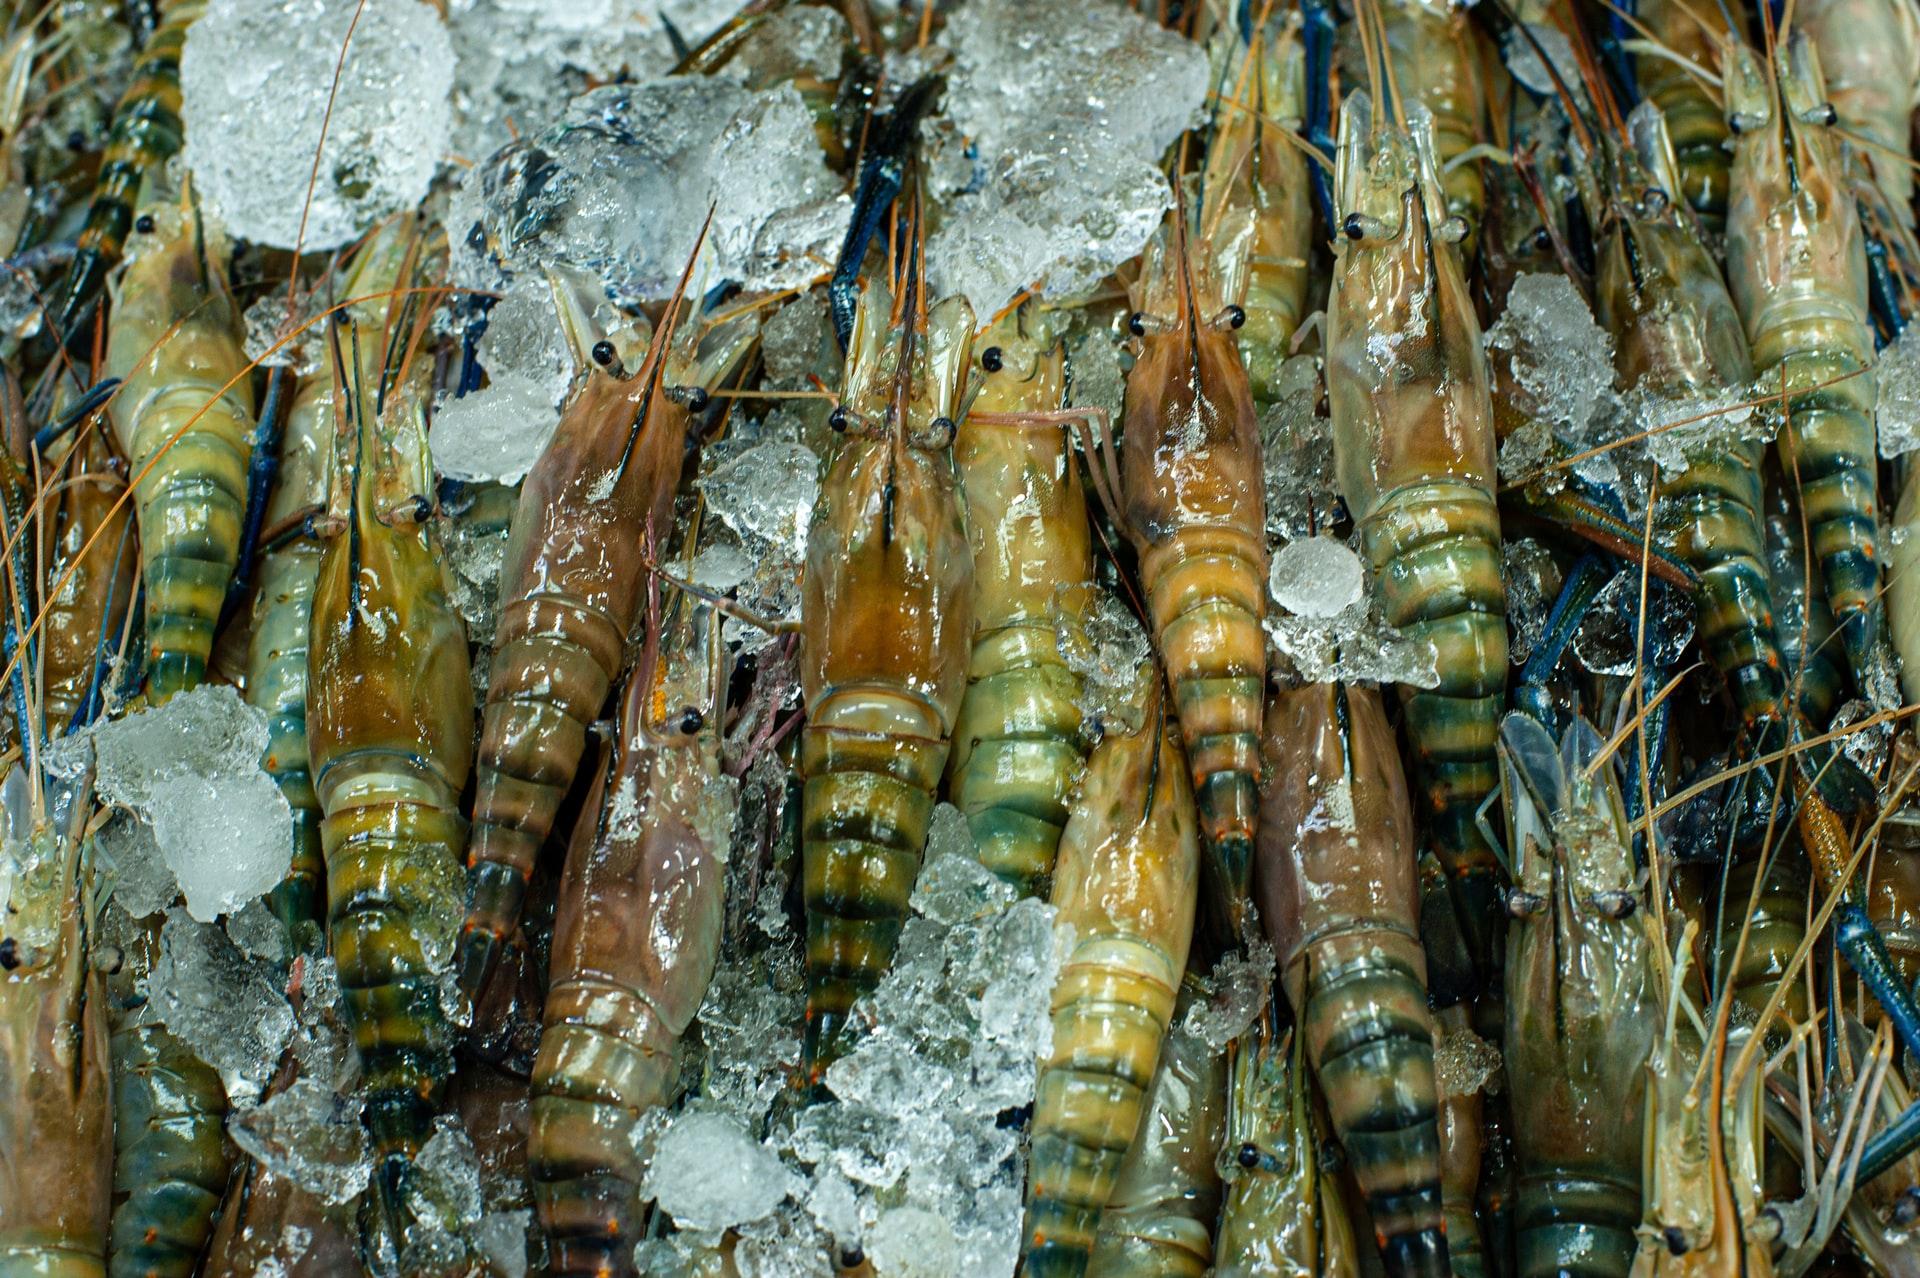 vietnam shrimp